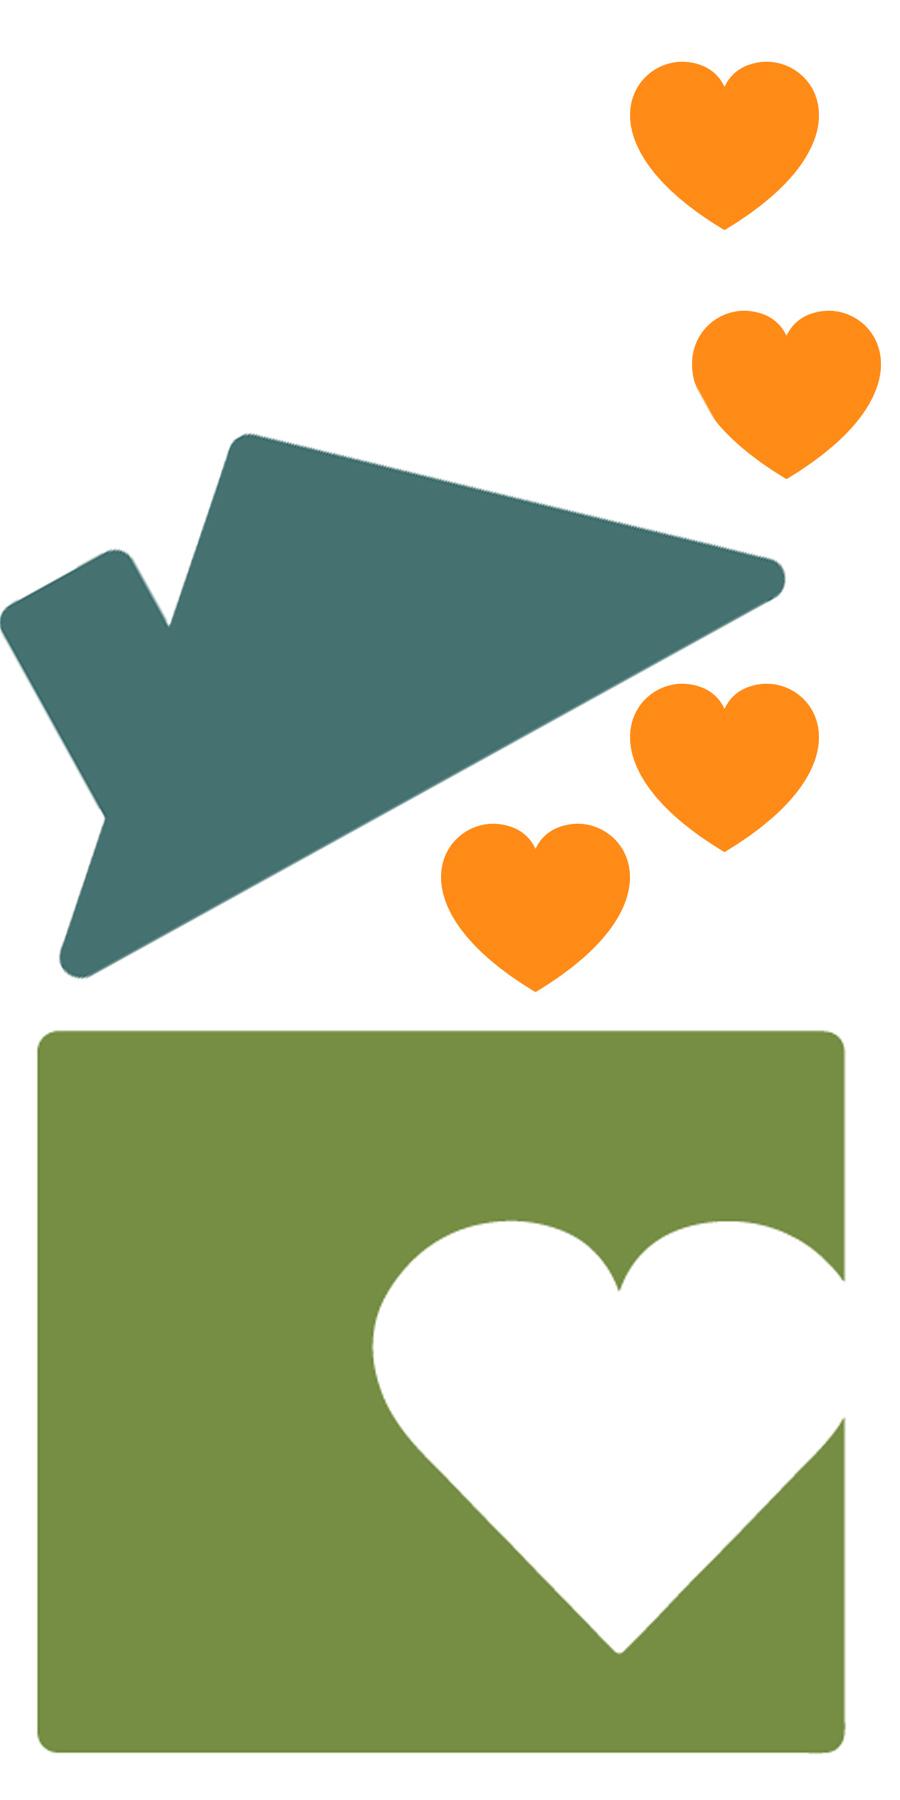 HouseLogo-OrangeHearts_DonatePage-1